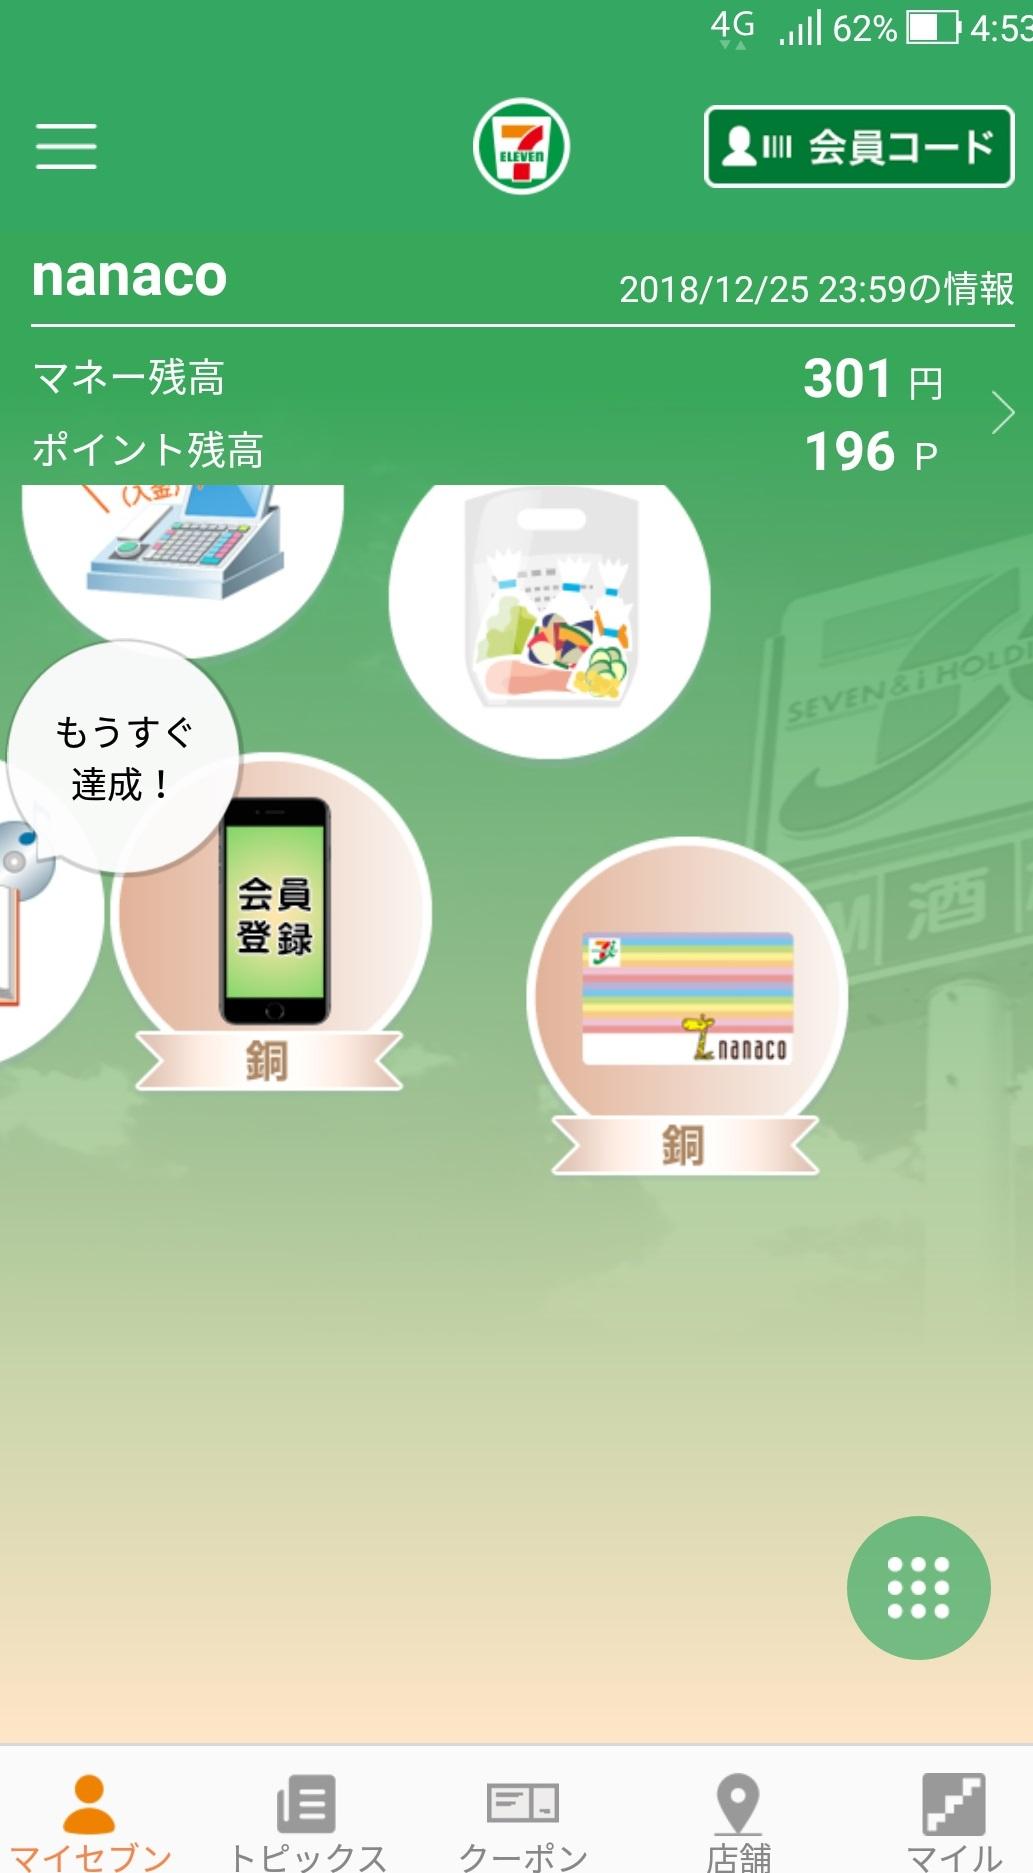 sumaho_app_seven_nanaco.jpg